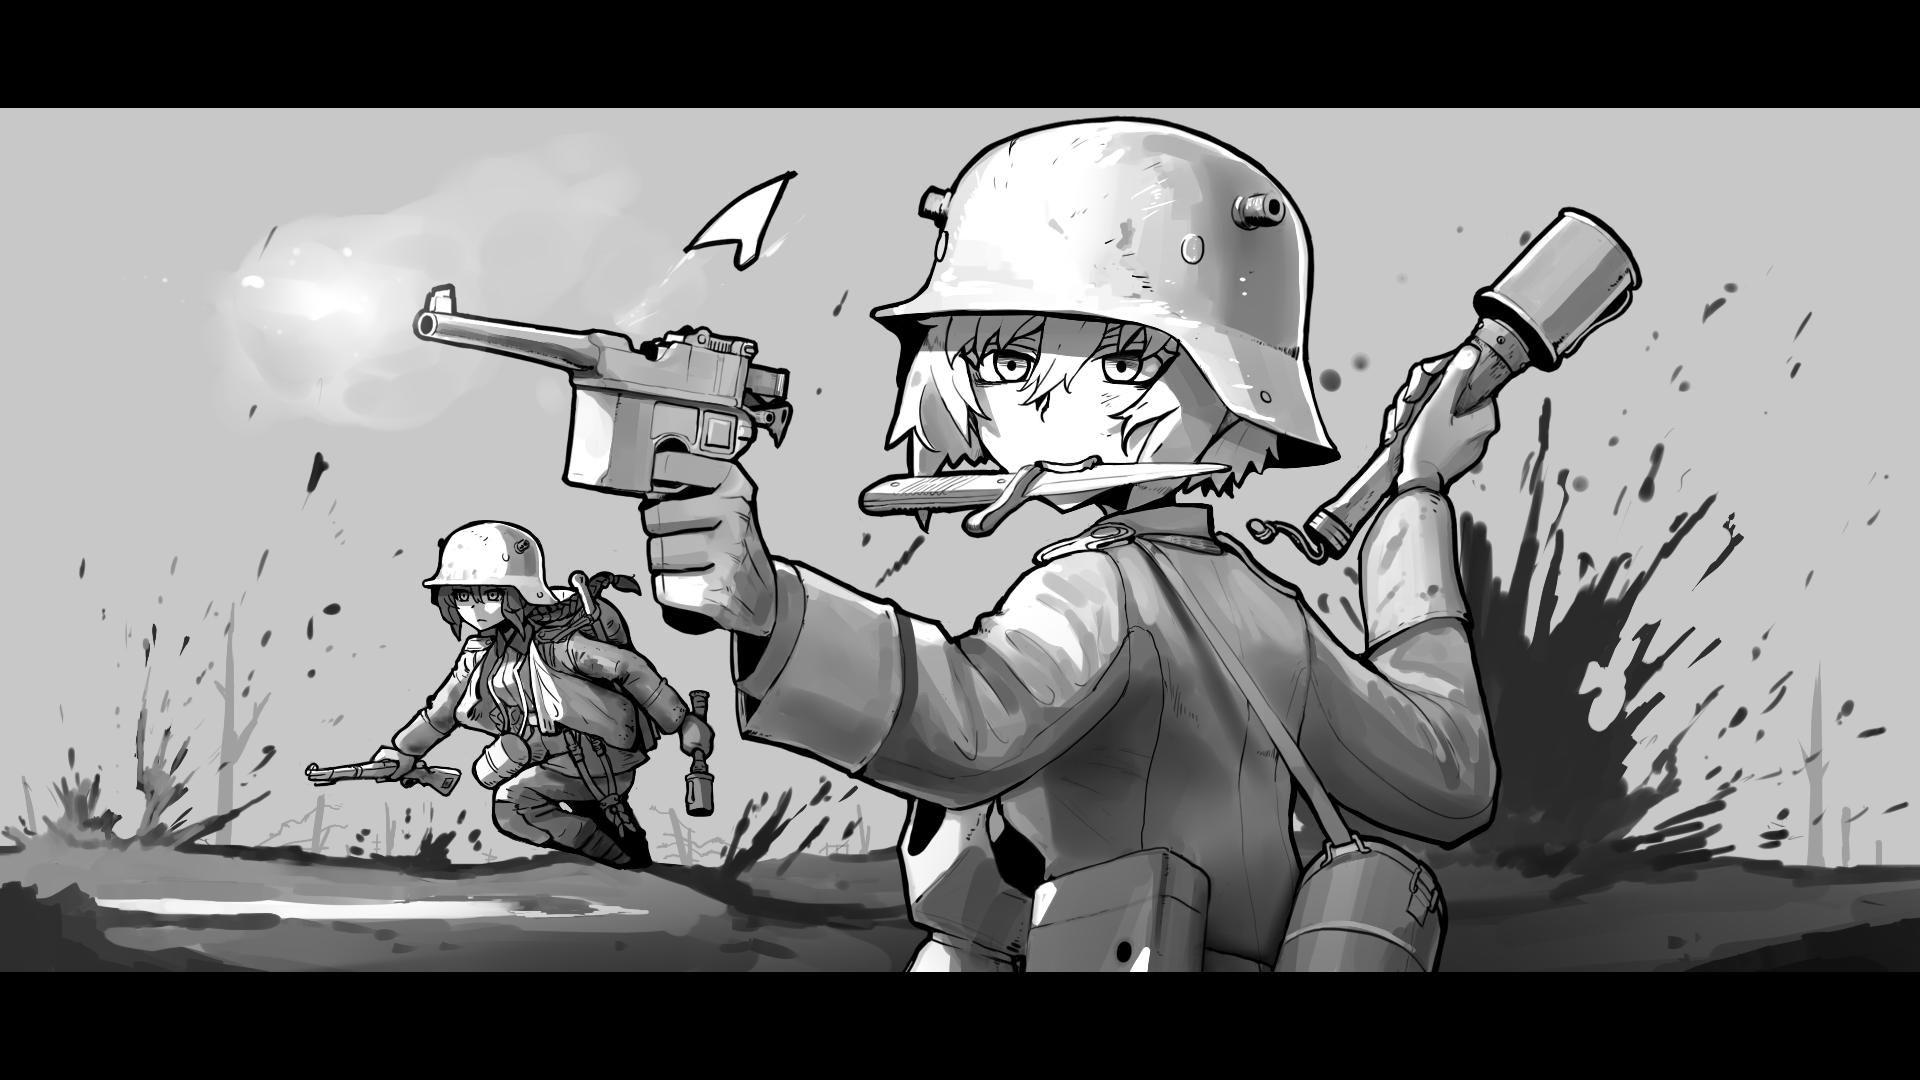 Erica On Twitter Anime Military Military Drawings War Art